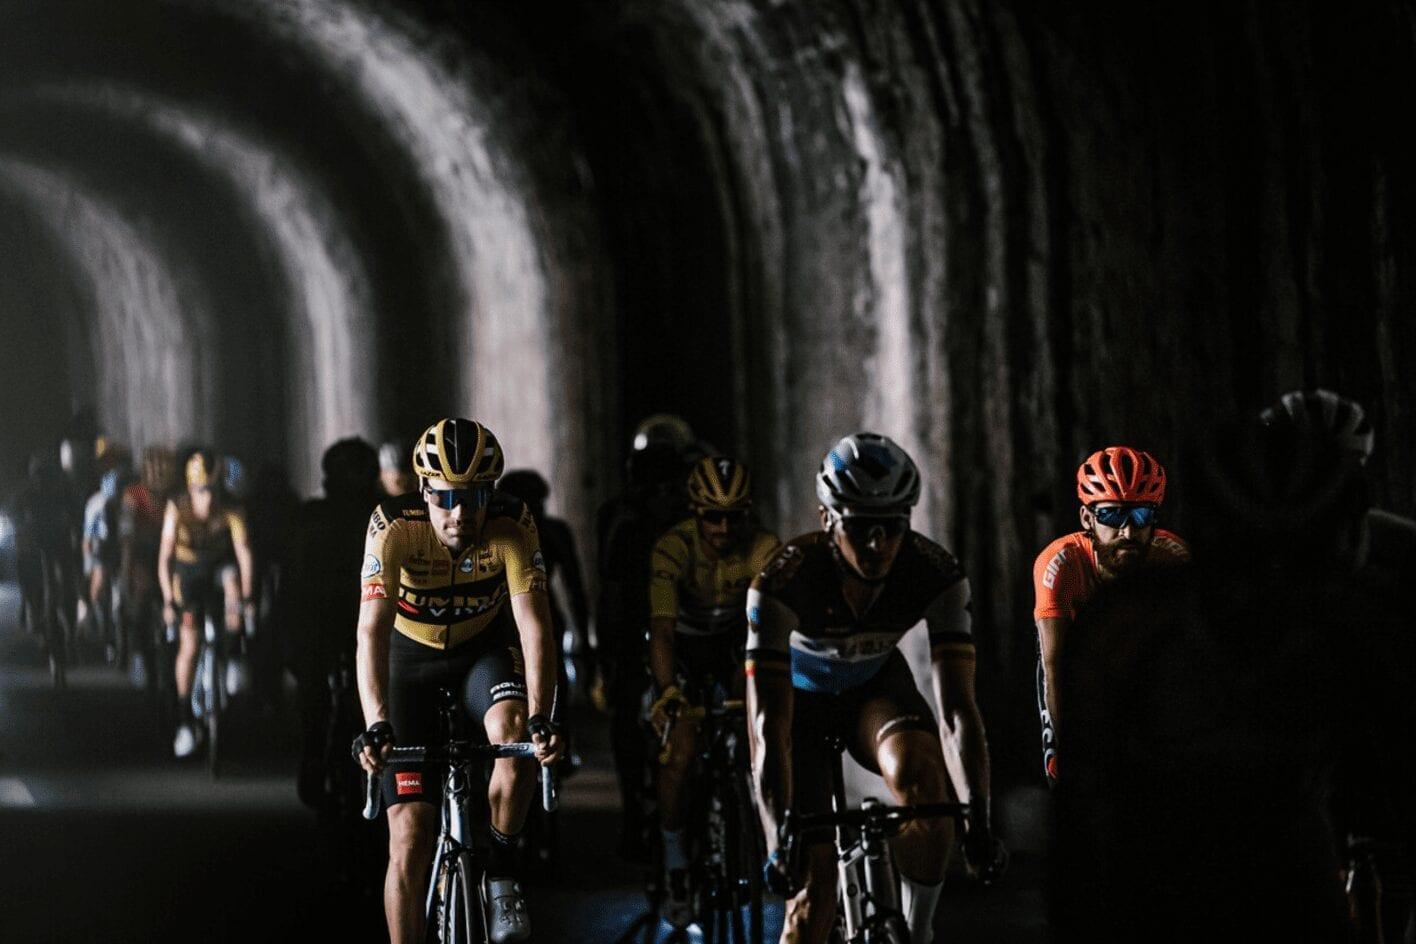 Simon Geschke und Tom Dumoulin bei der Tour de France